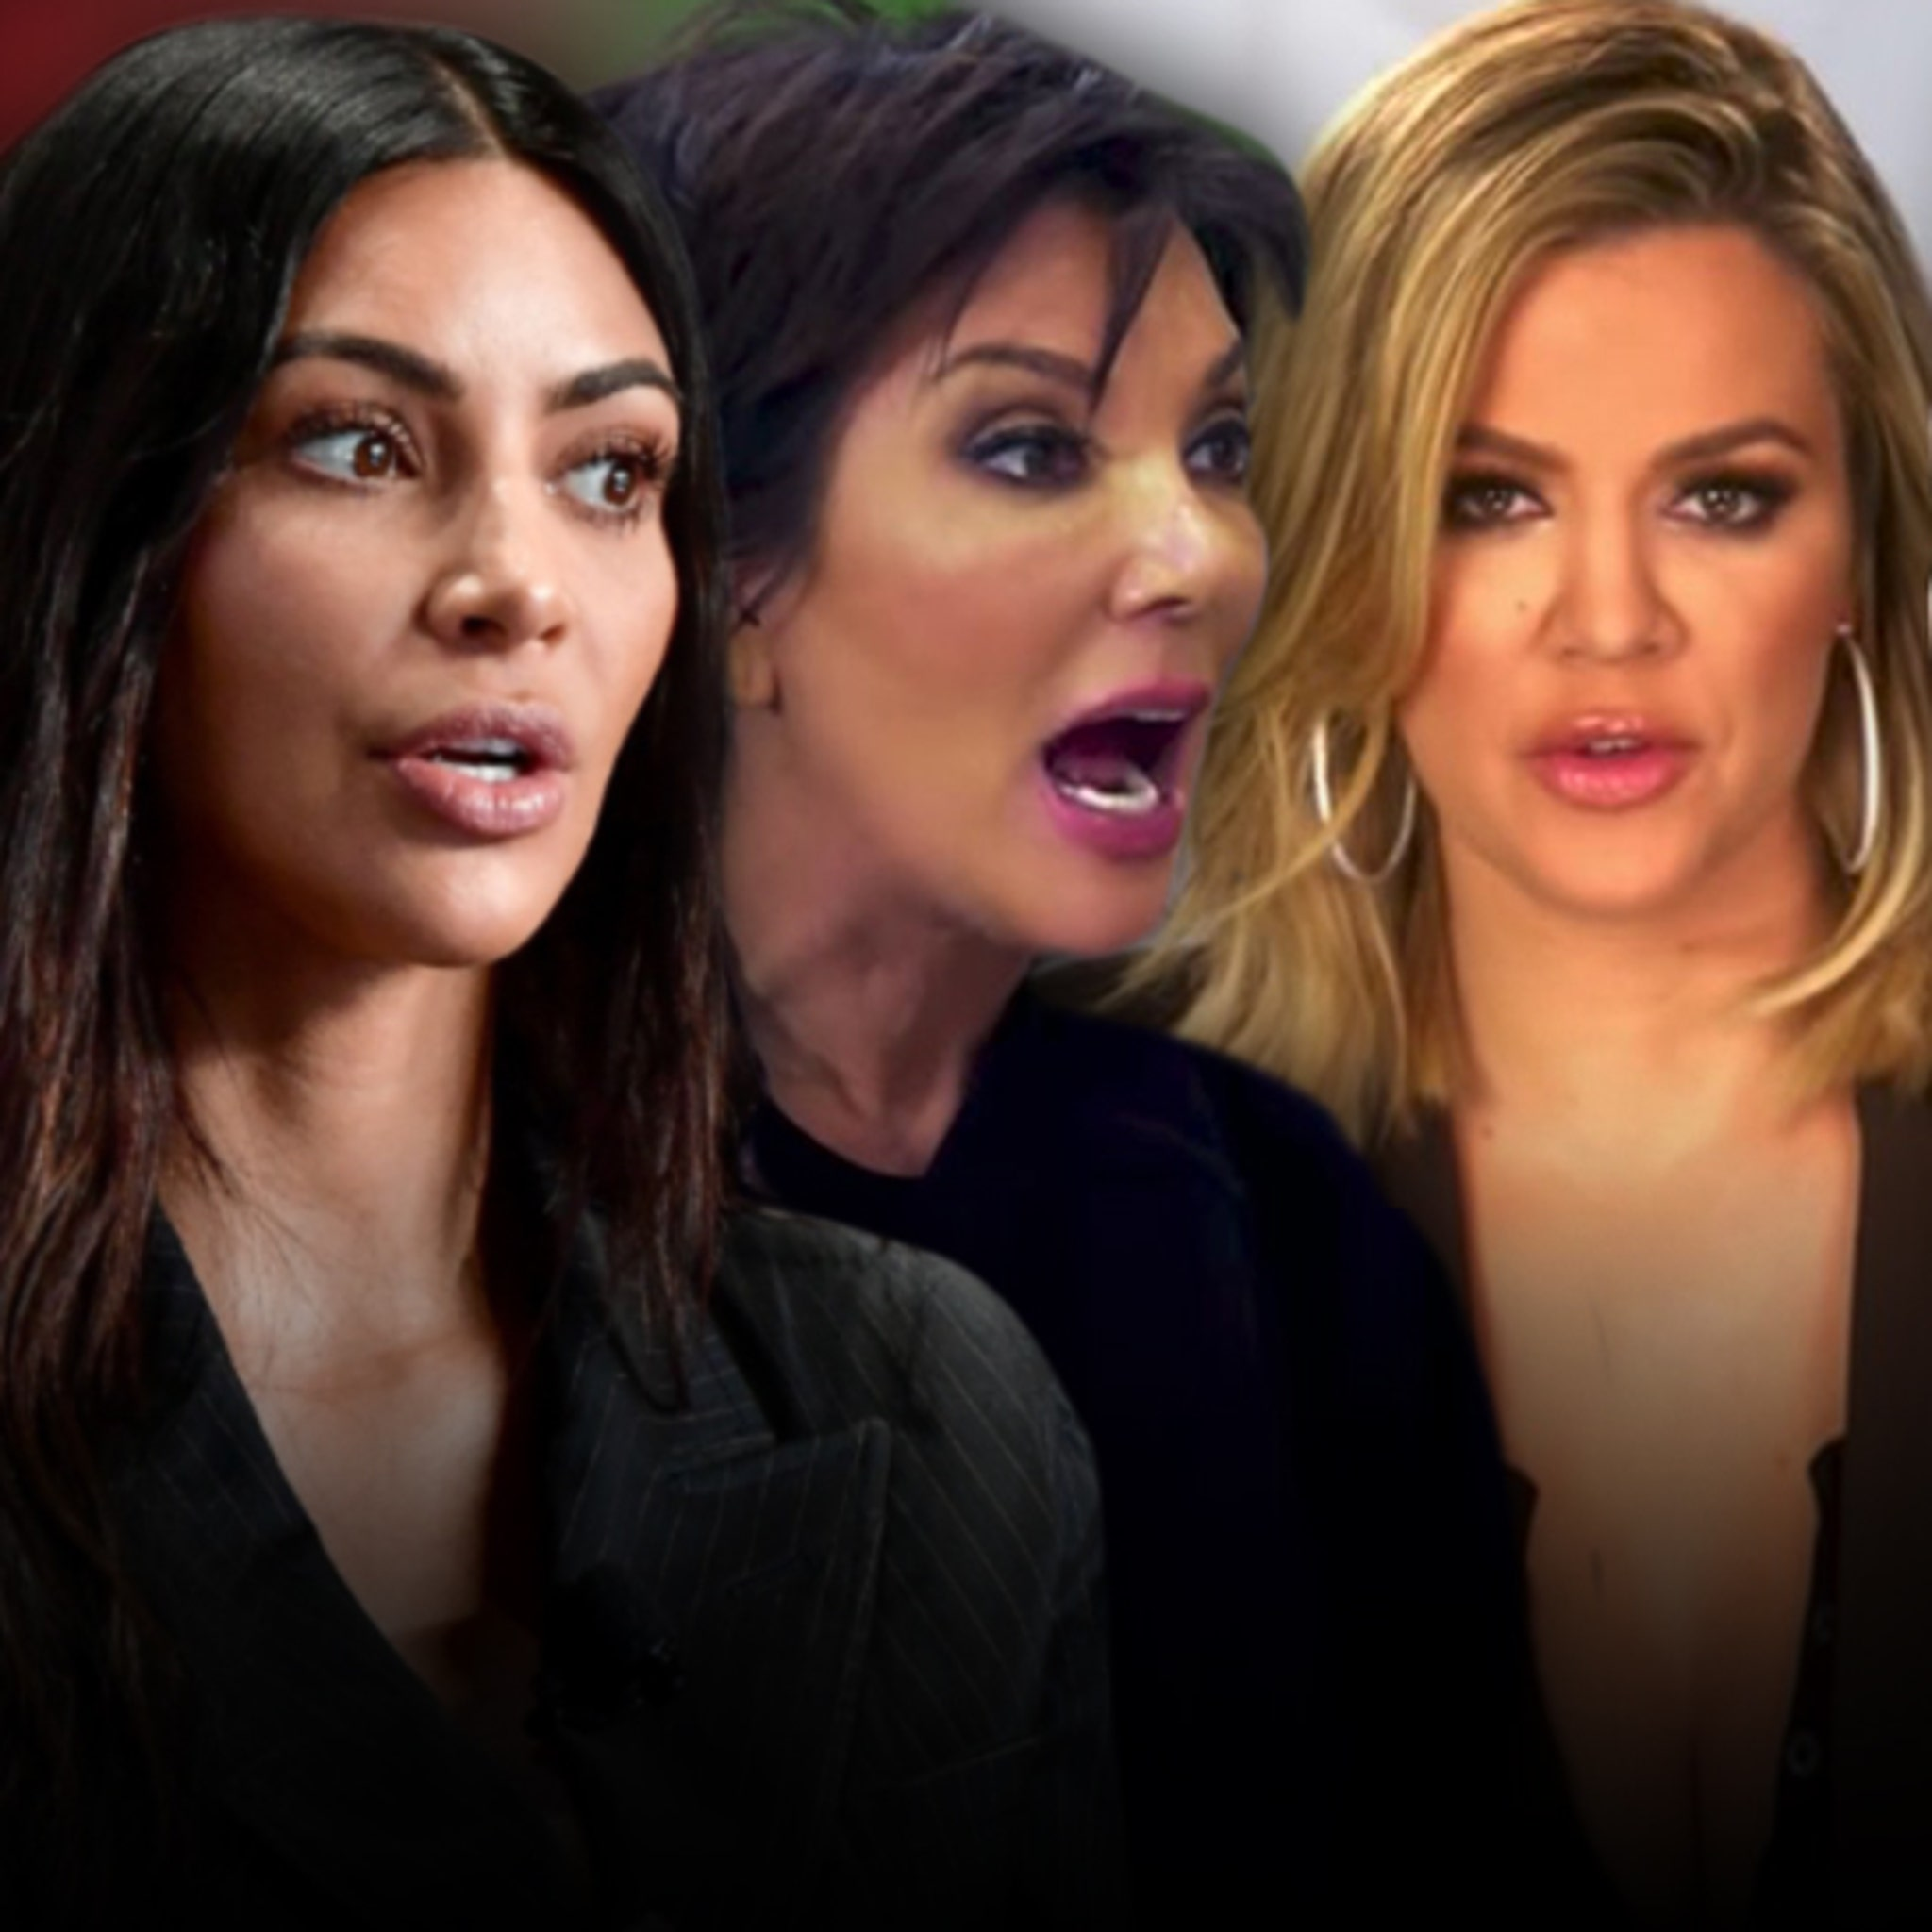 4a1dc4c9495 Kris, Kim, Khloe, Kourtney Kardashian Sued for $32 MILLION Over Beauty  Products